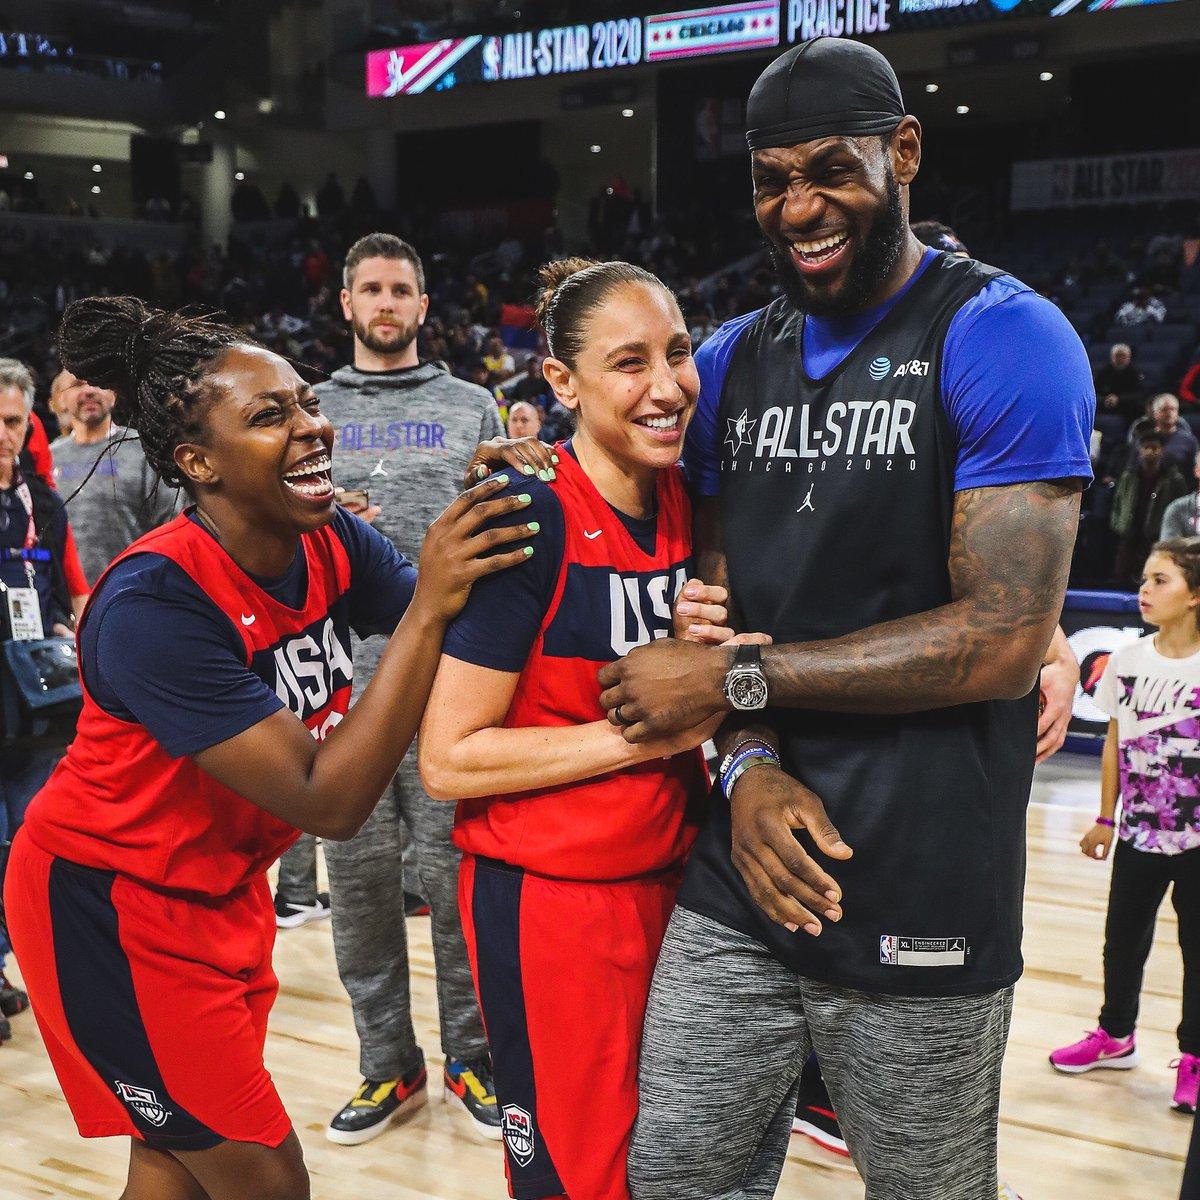 Basketball family 💜  #USAWNT x @NBAAllStar